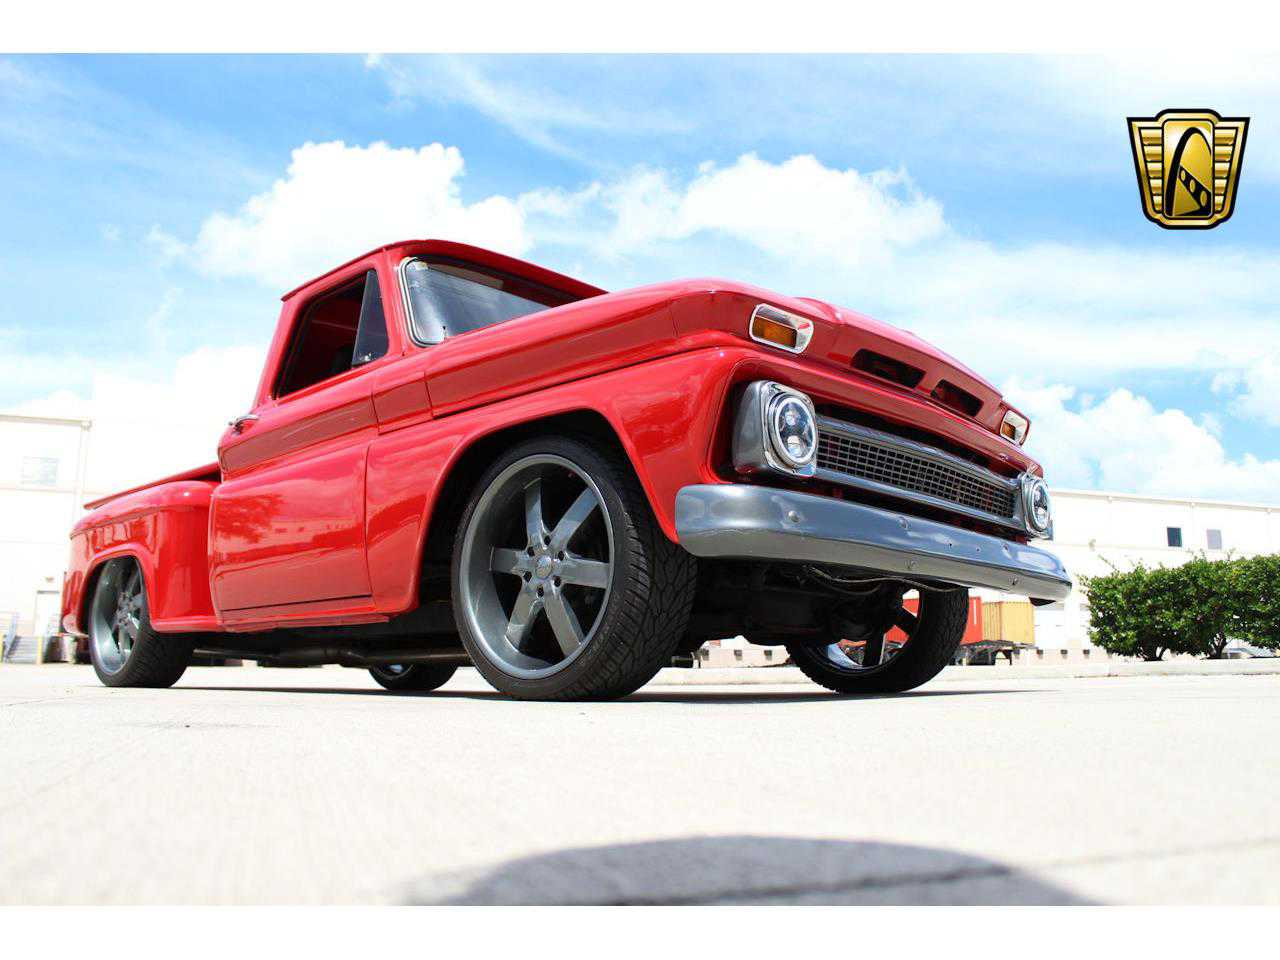 1964 Chevrolet C10 For Sale In Houston Tx Gcchou1334 Chevy Truck Grille Prev